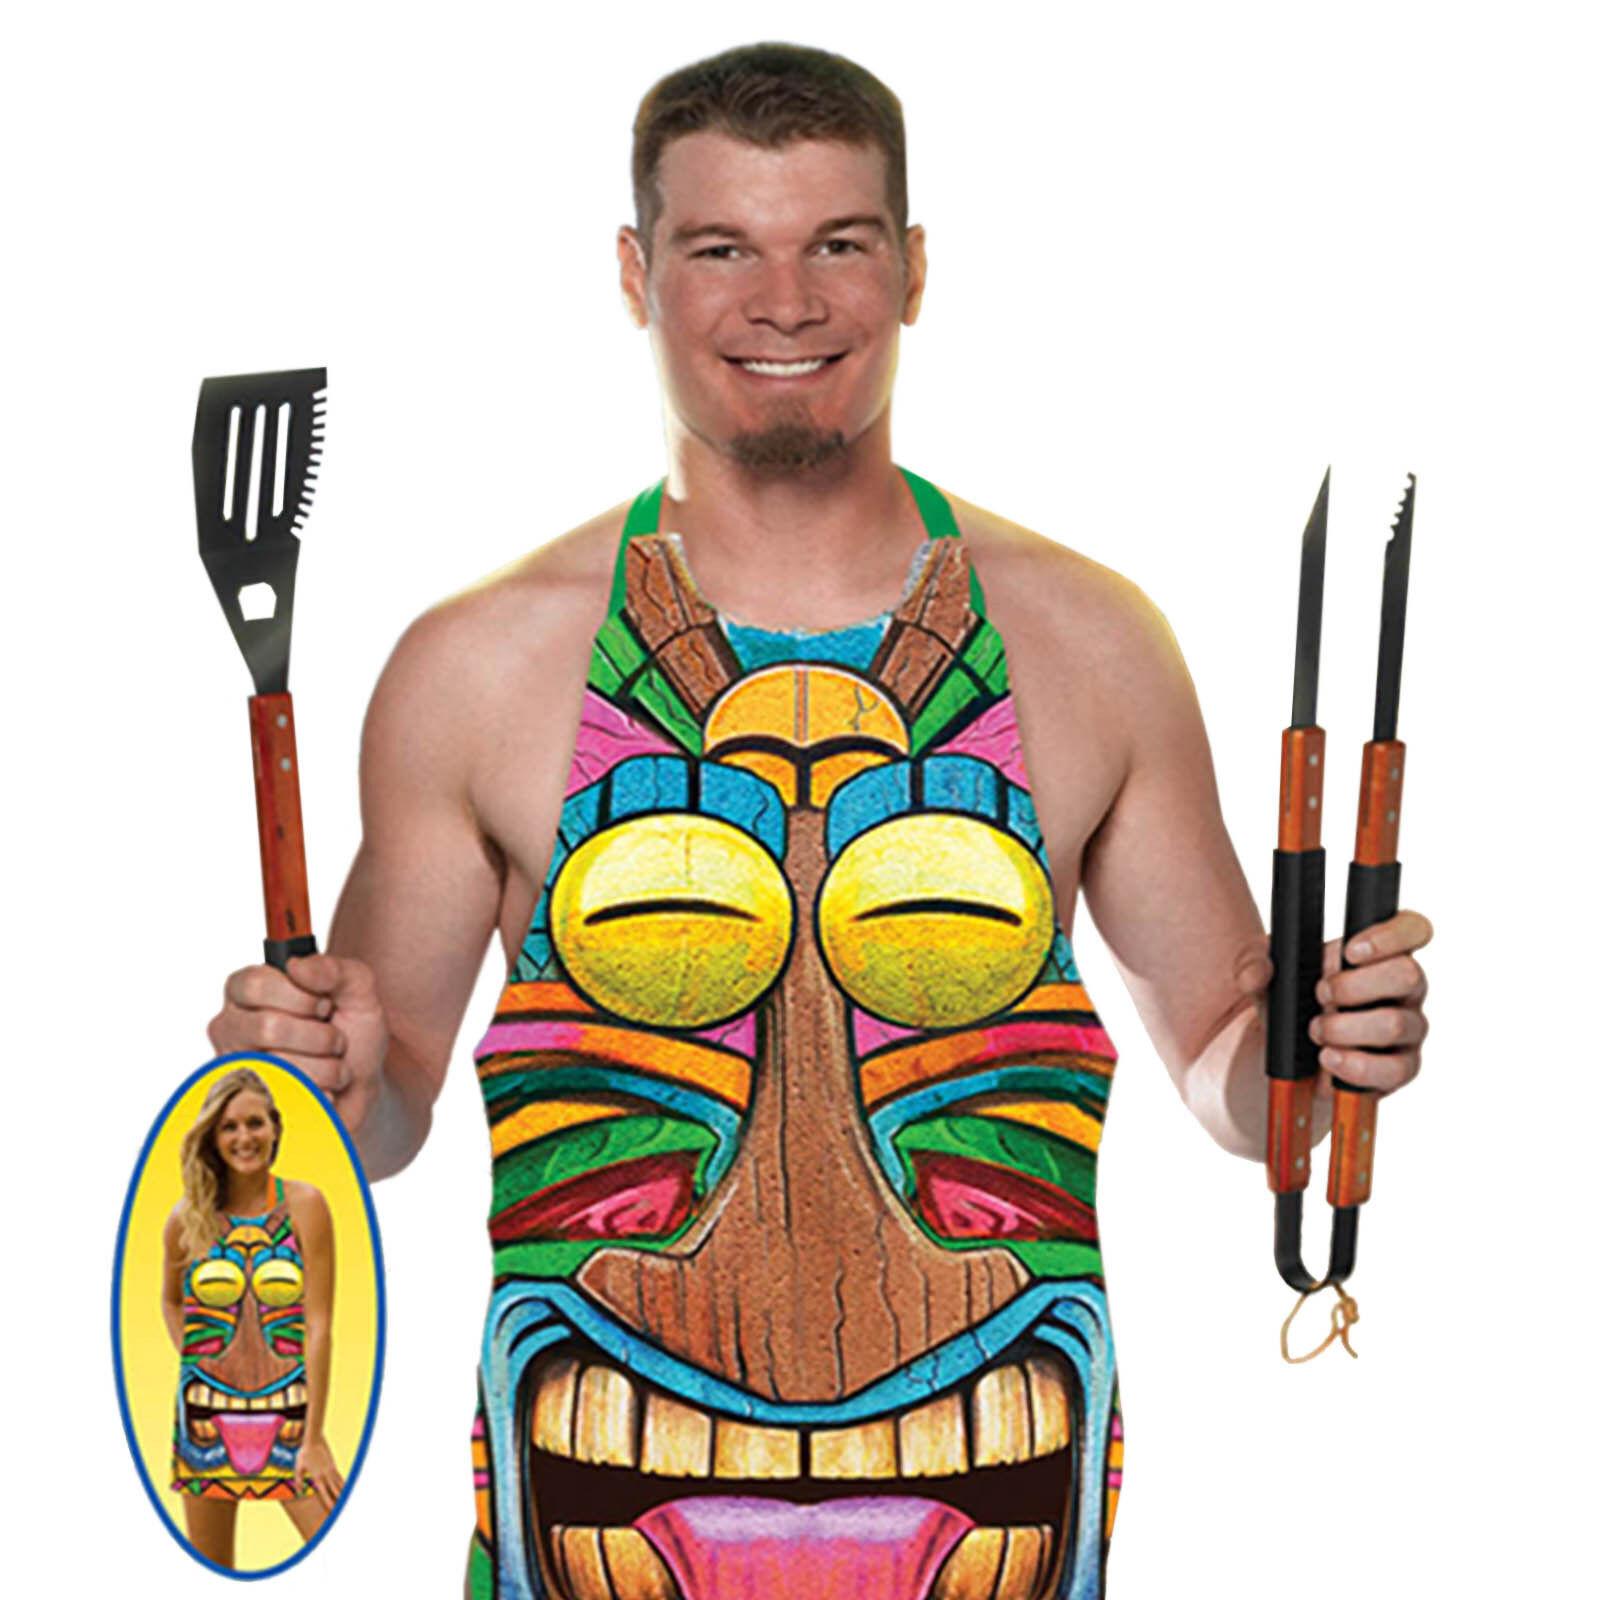 White half apron ebay - Tropical Summer Barbecue Party Tiki Totem Fancy Dress Plastic Apron